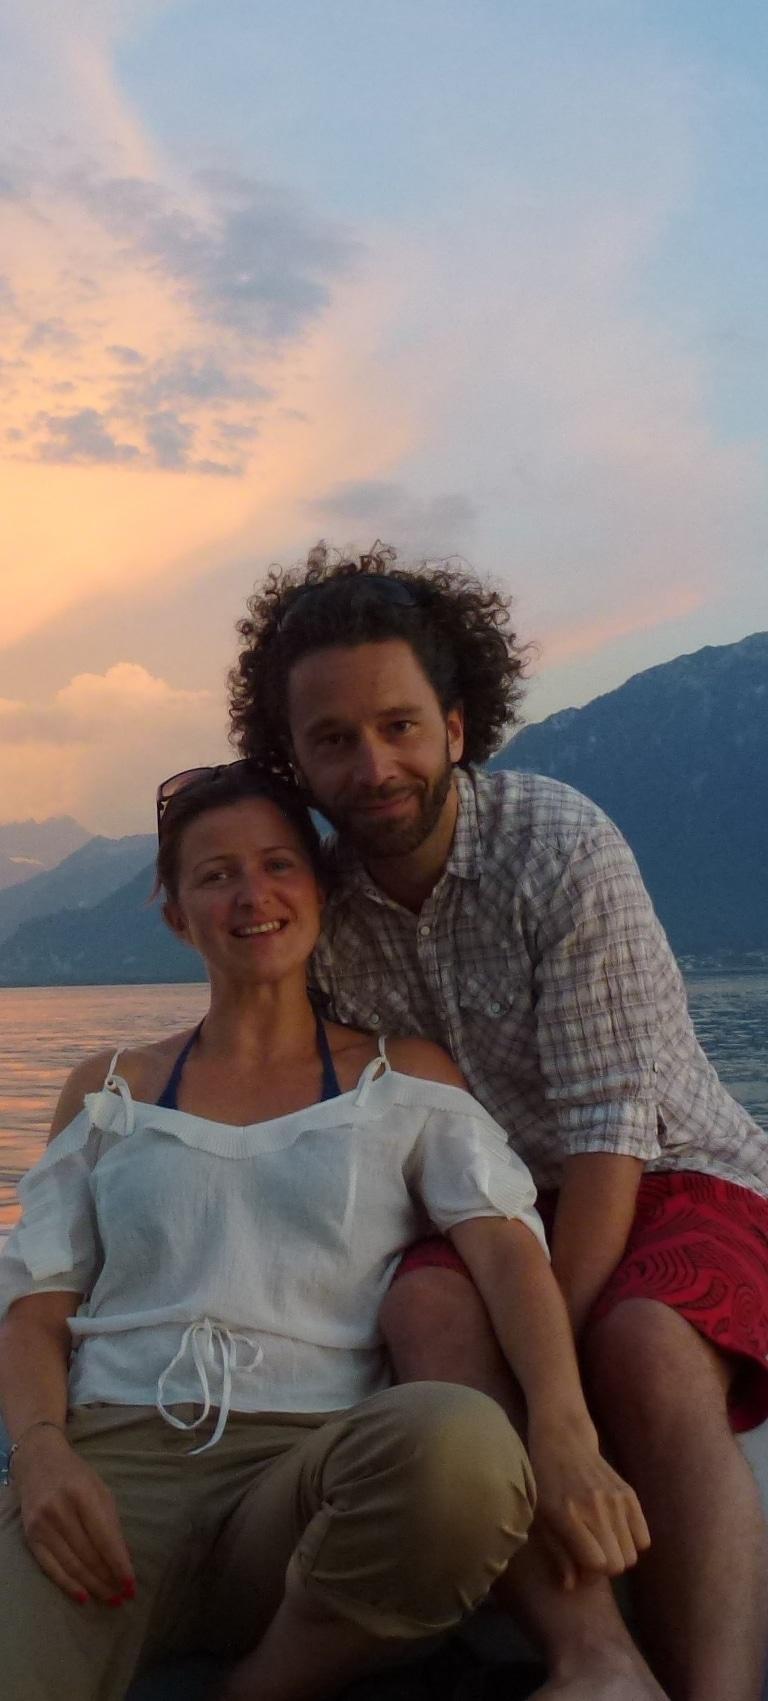 Aurélie & Daniel from Lausanne